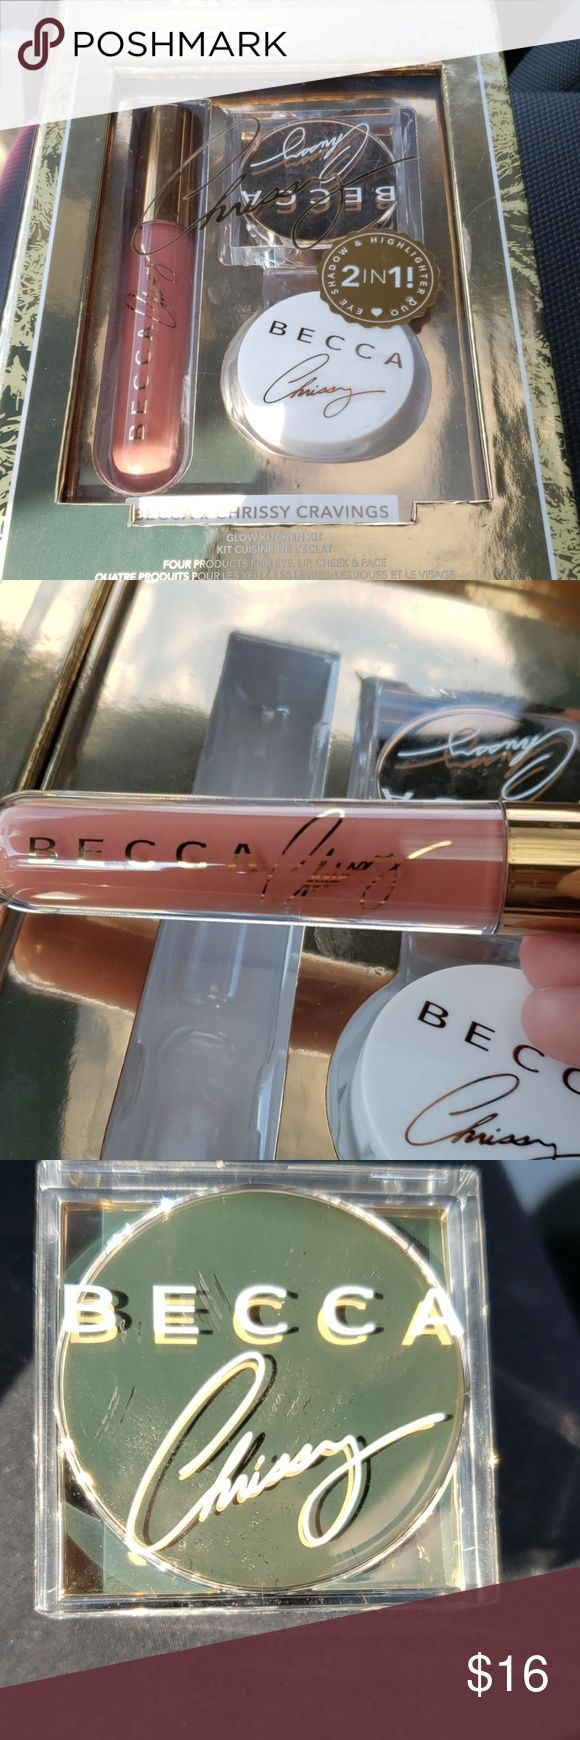 Becca x crissy eyeshadow, highlighter, lip gloss Model new no merchandise ever used…